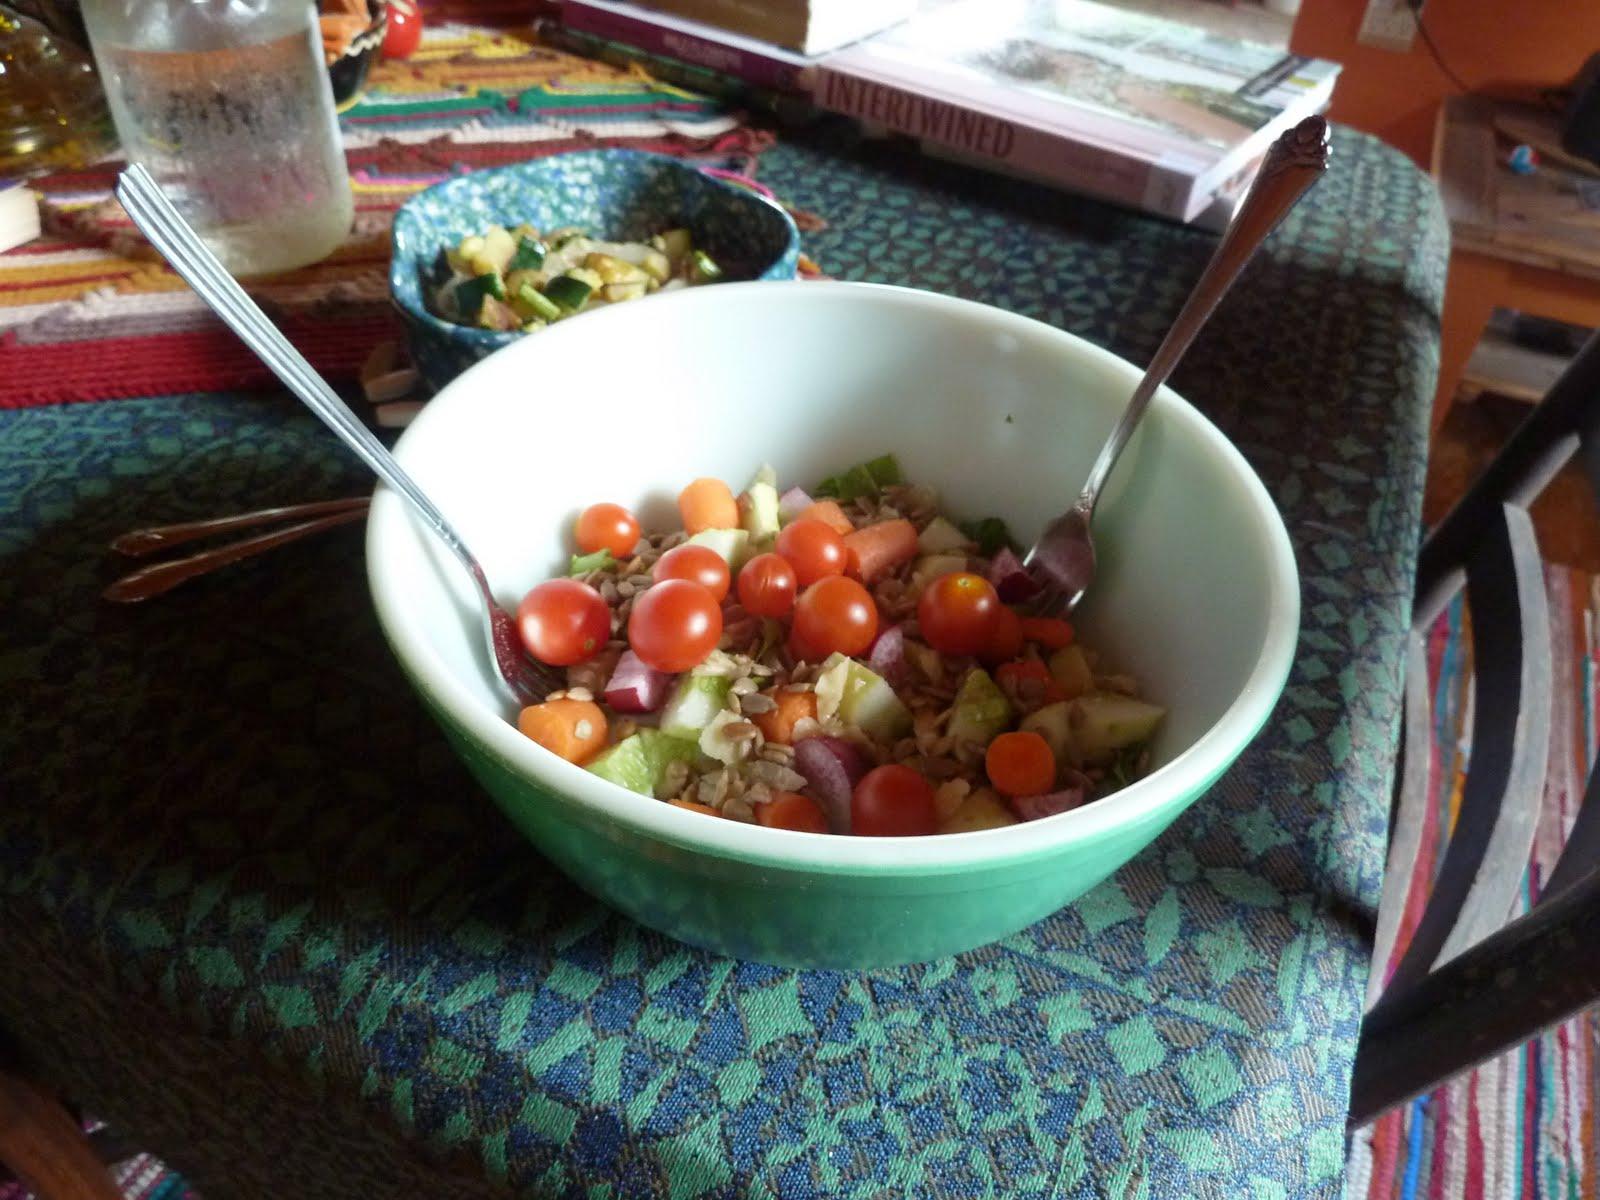 The Common Milkweed Jethro Bodine Salad A Summer Favorite